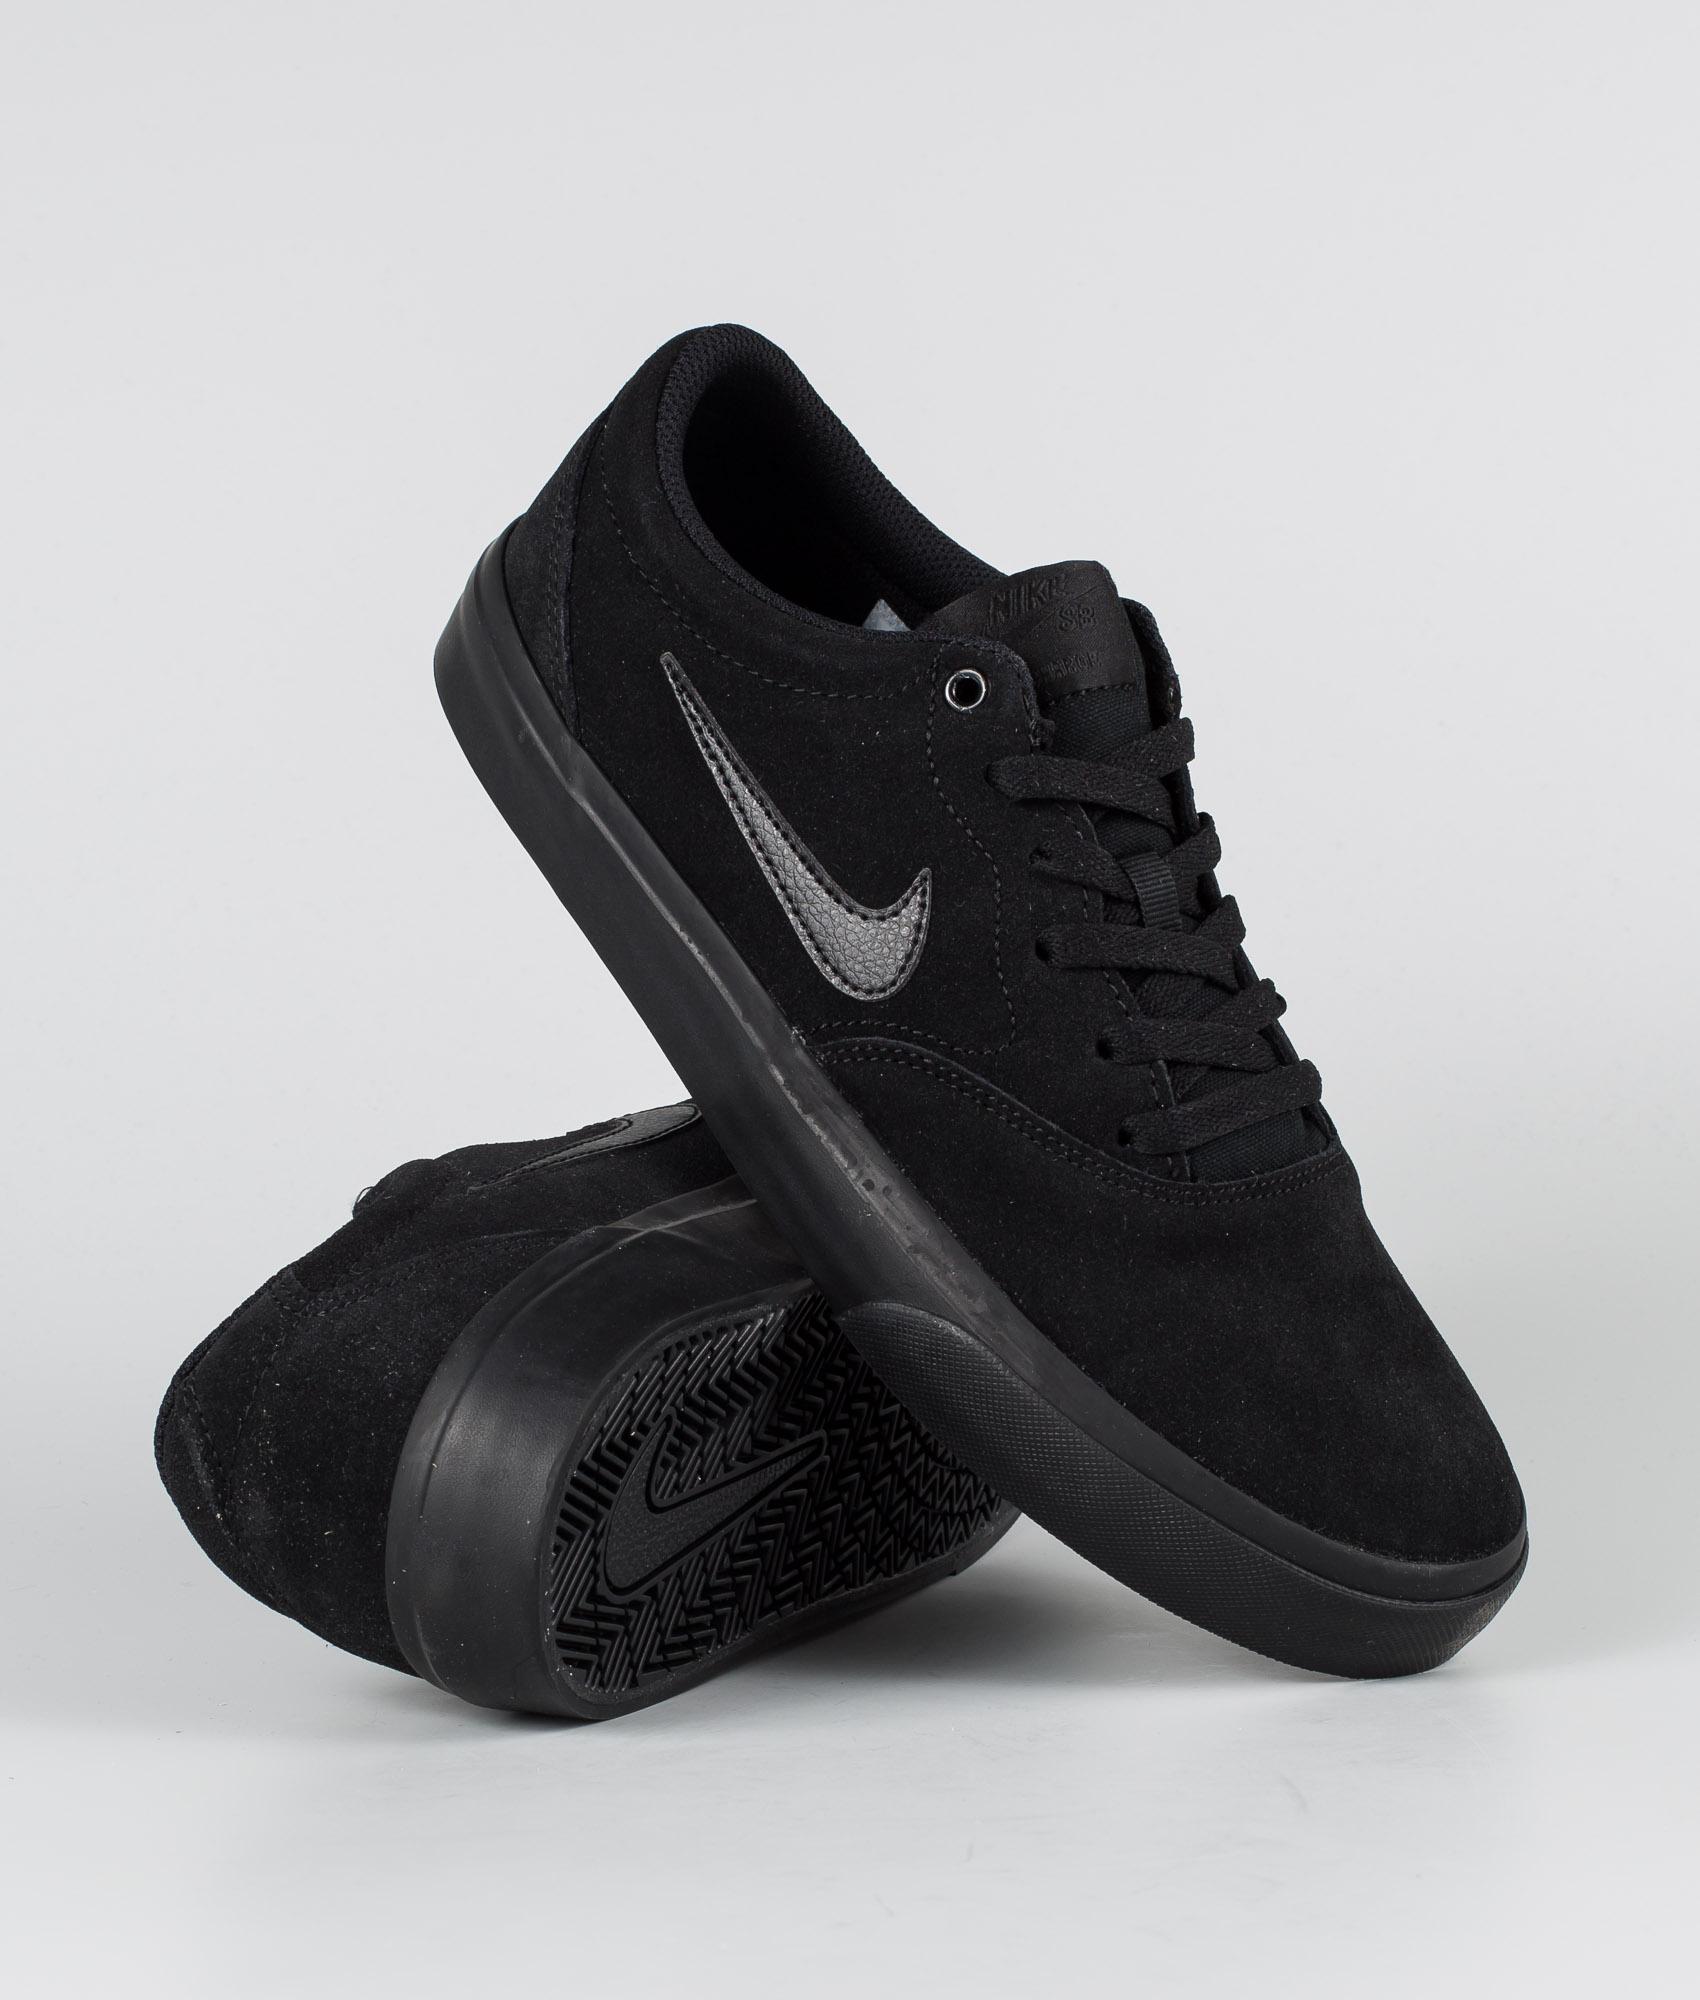 Nike SB Charge Suede Shoes Black/Black